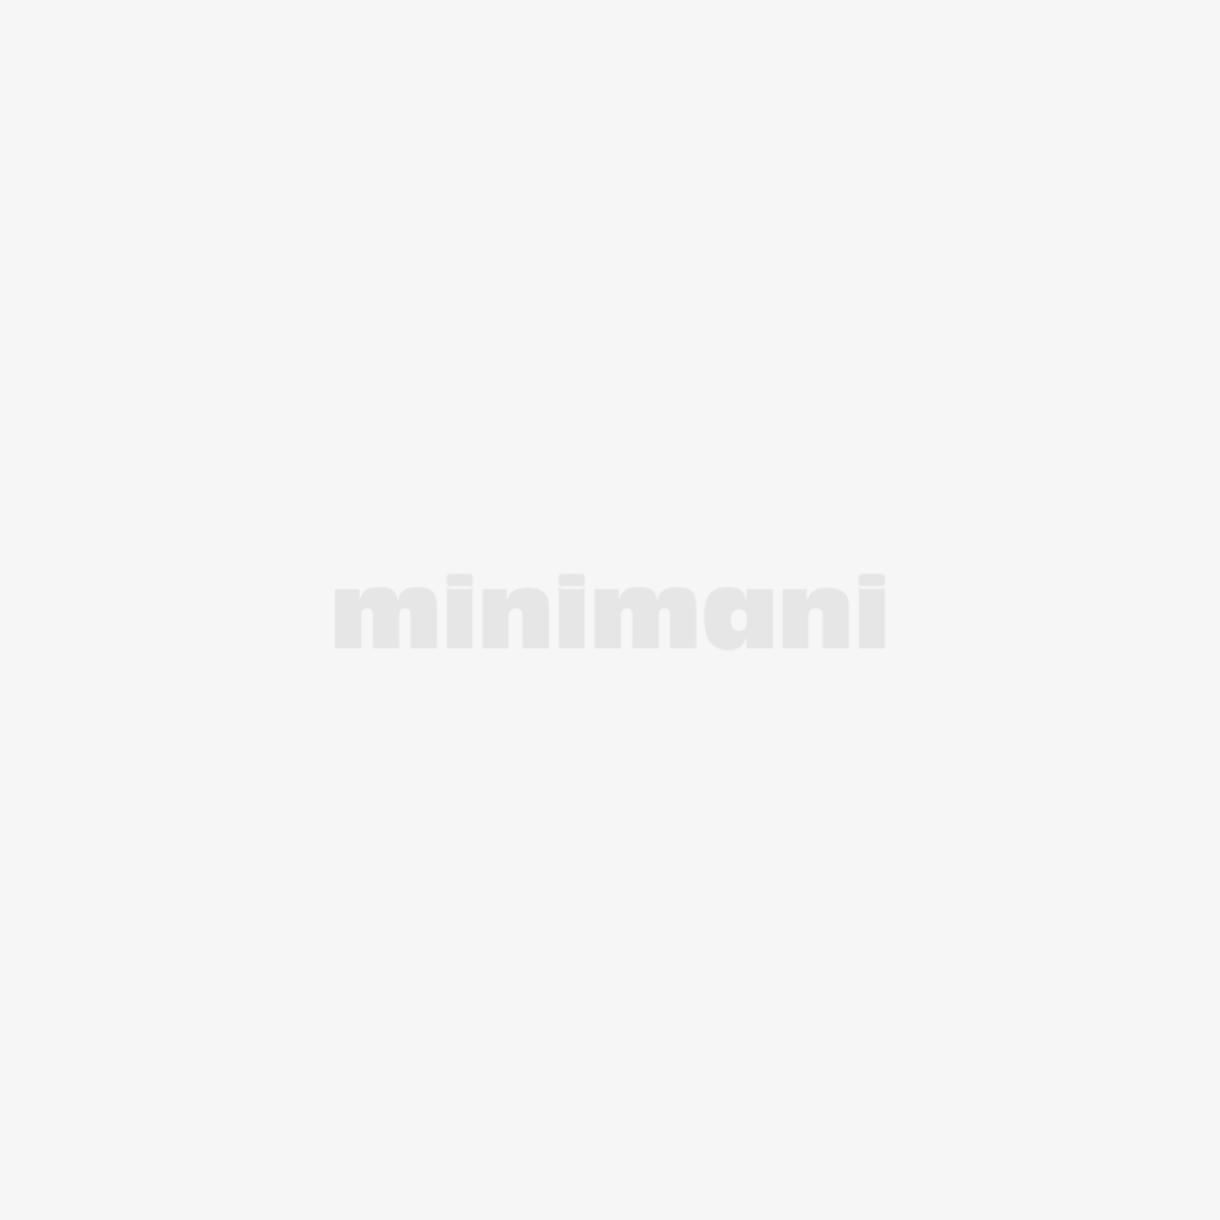 REMINGTON MB050 DURABLADE GROOMER